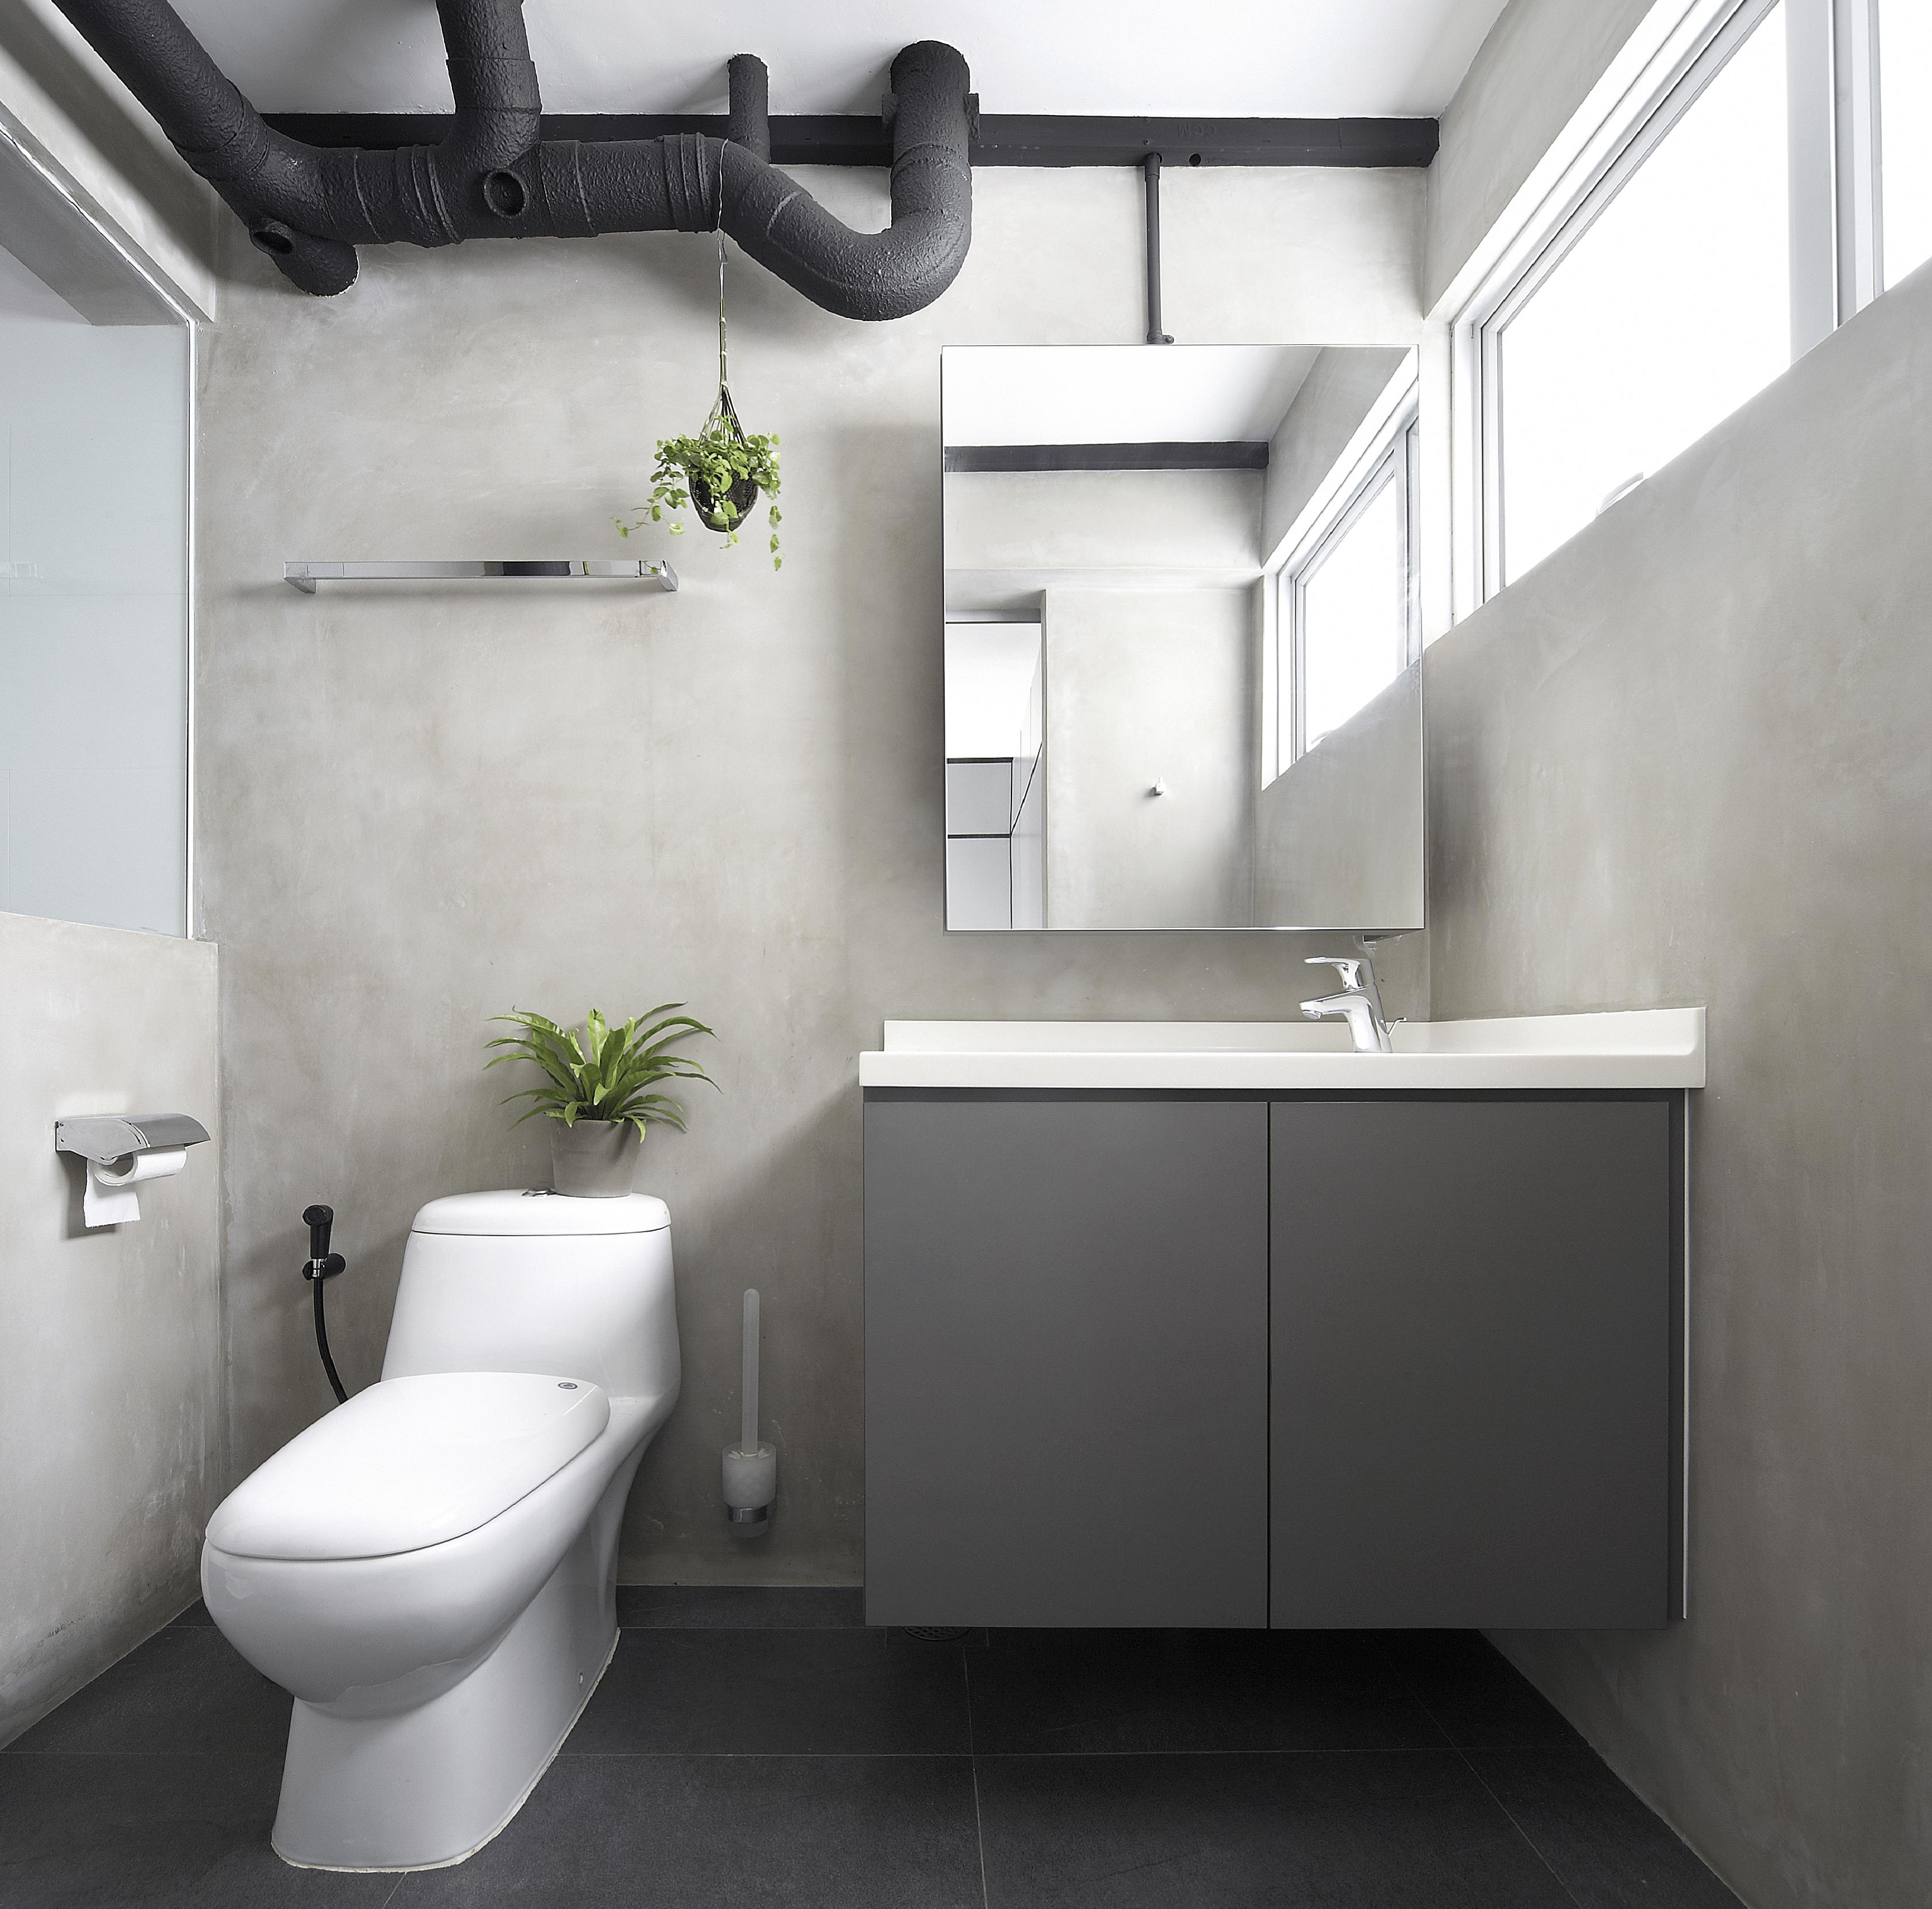 fsi designer page (2) - Home Renovation Singapore